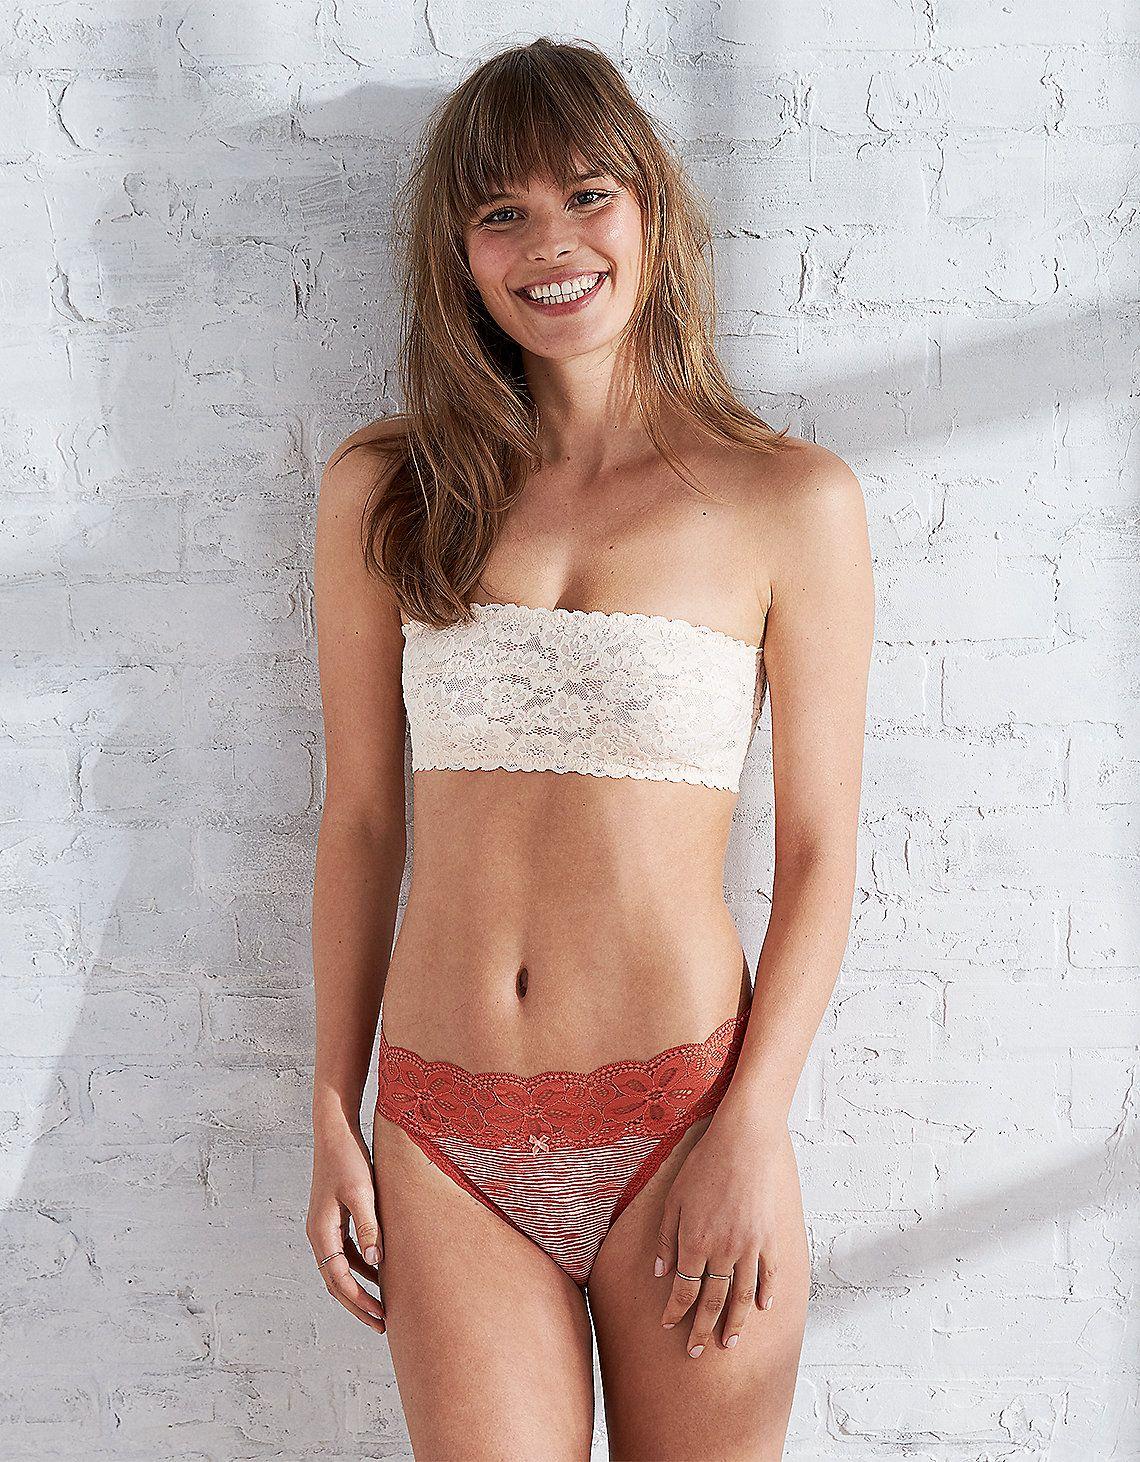 Commit Swiss girls in panties